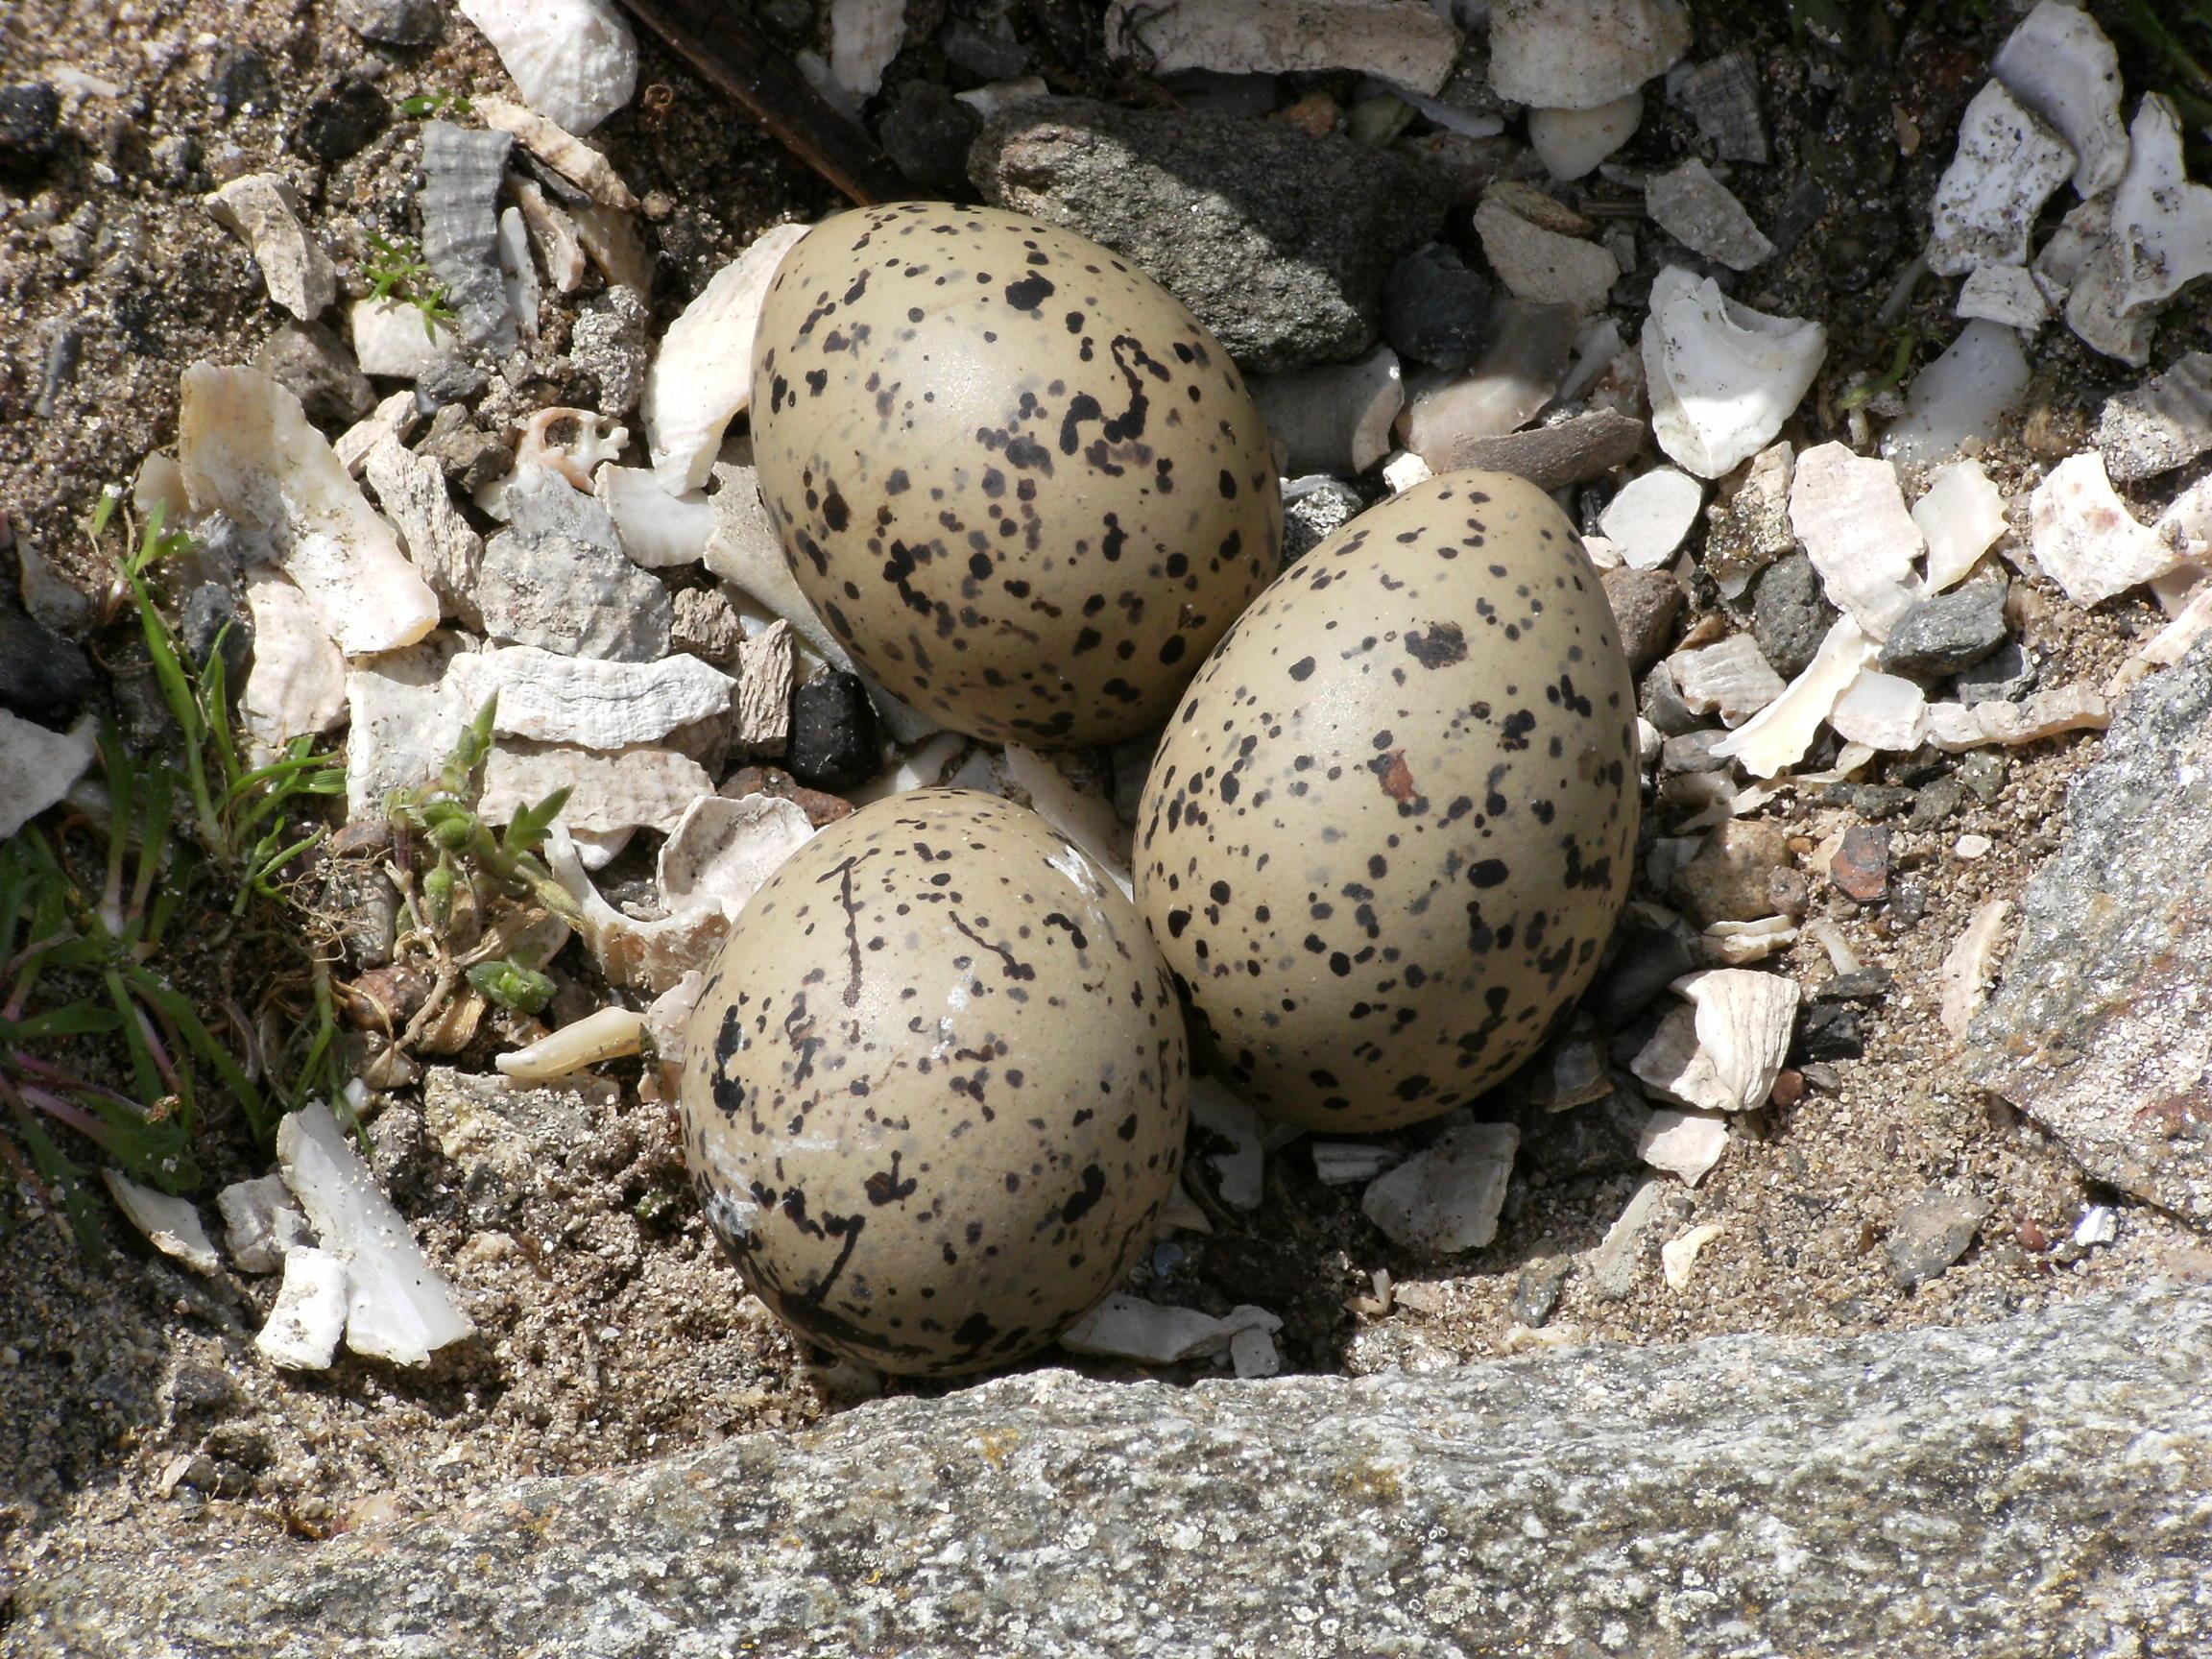 Mayo in May 2009 - Oystercatcher Eggs, Iniskea